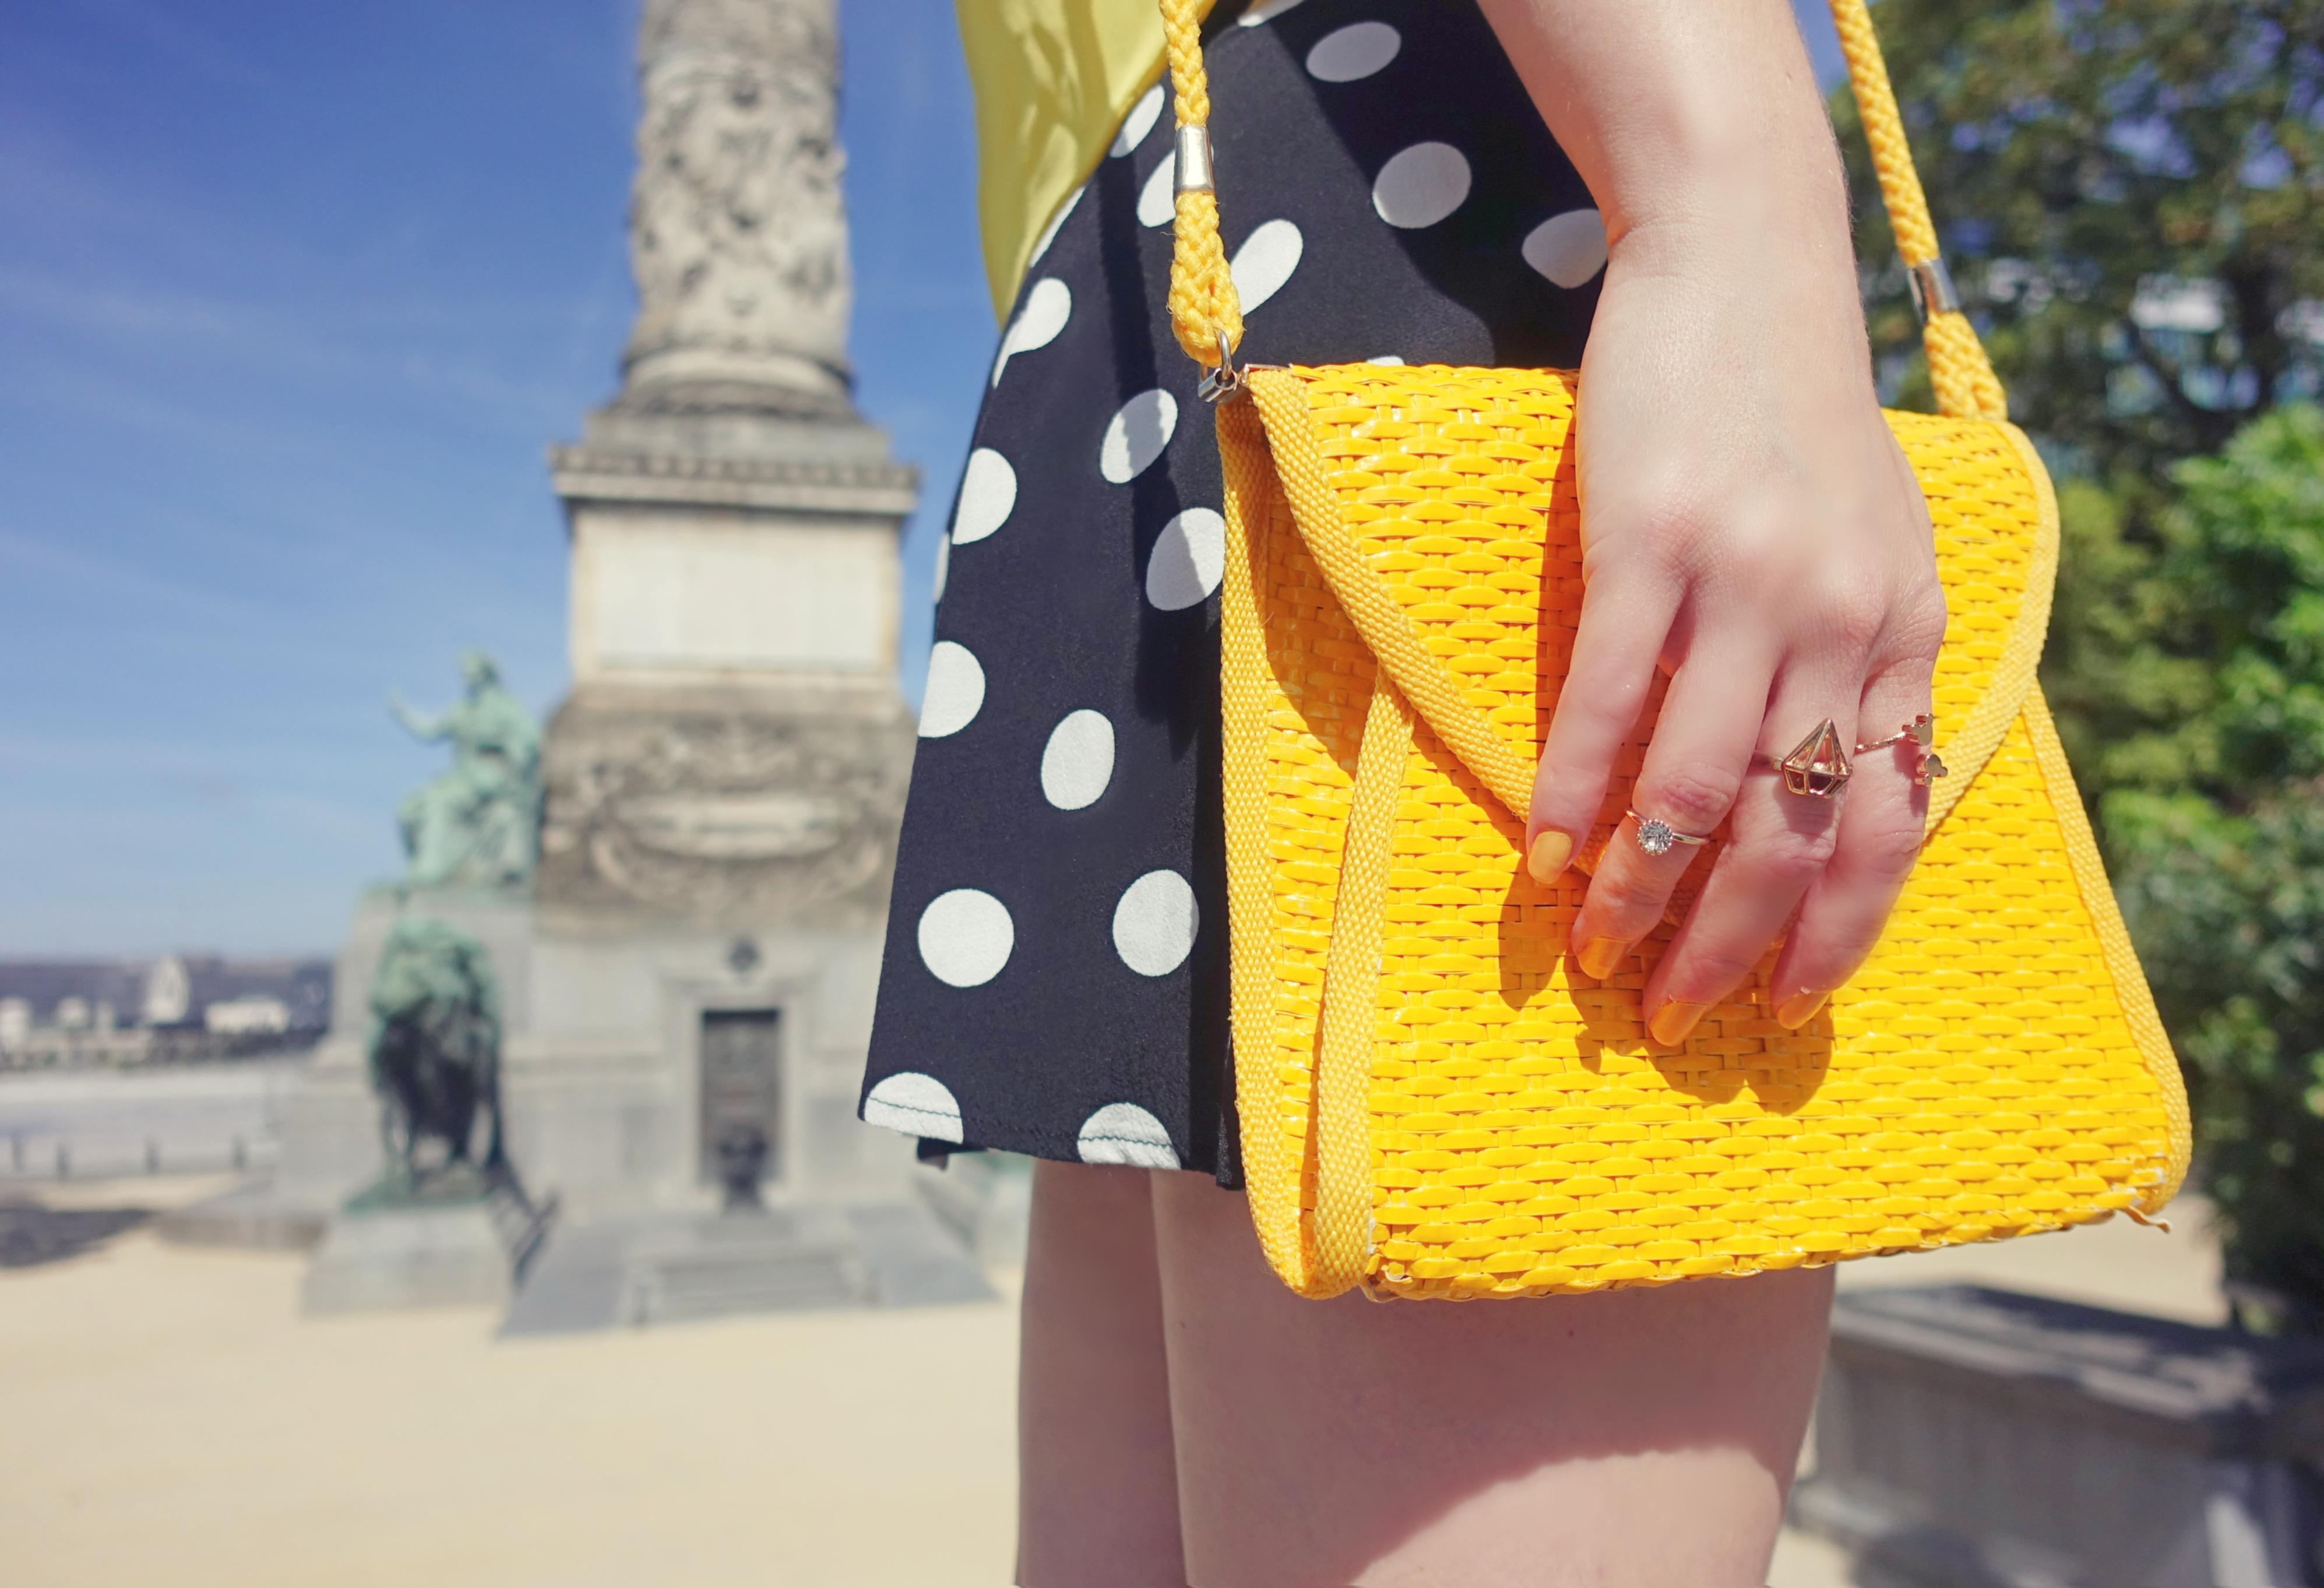 Bolsos-de-verano-PiensaenChic-blog-de-moda-ChicAdicta-influencer-polkadot-style-outfit-amarillo-Chic-adicta-Piensa-en-Chic